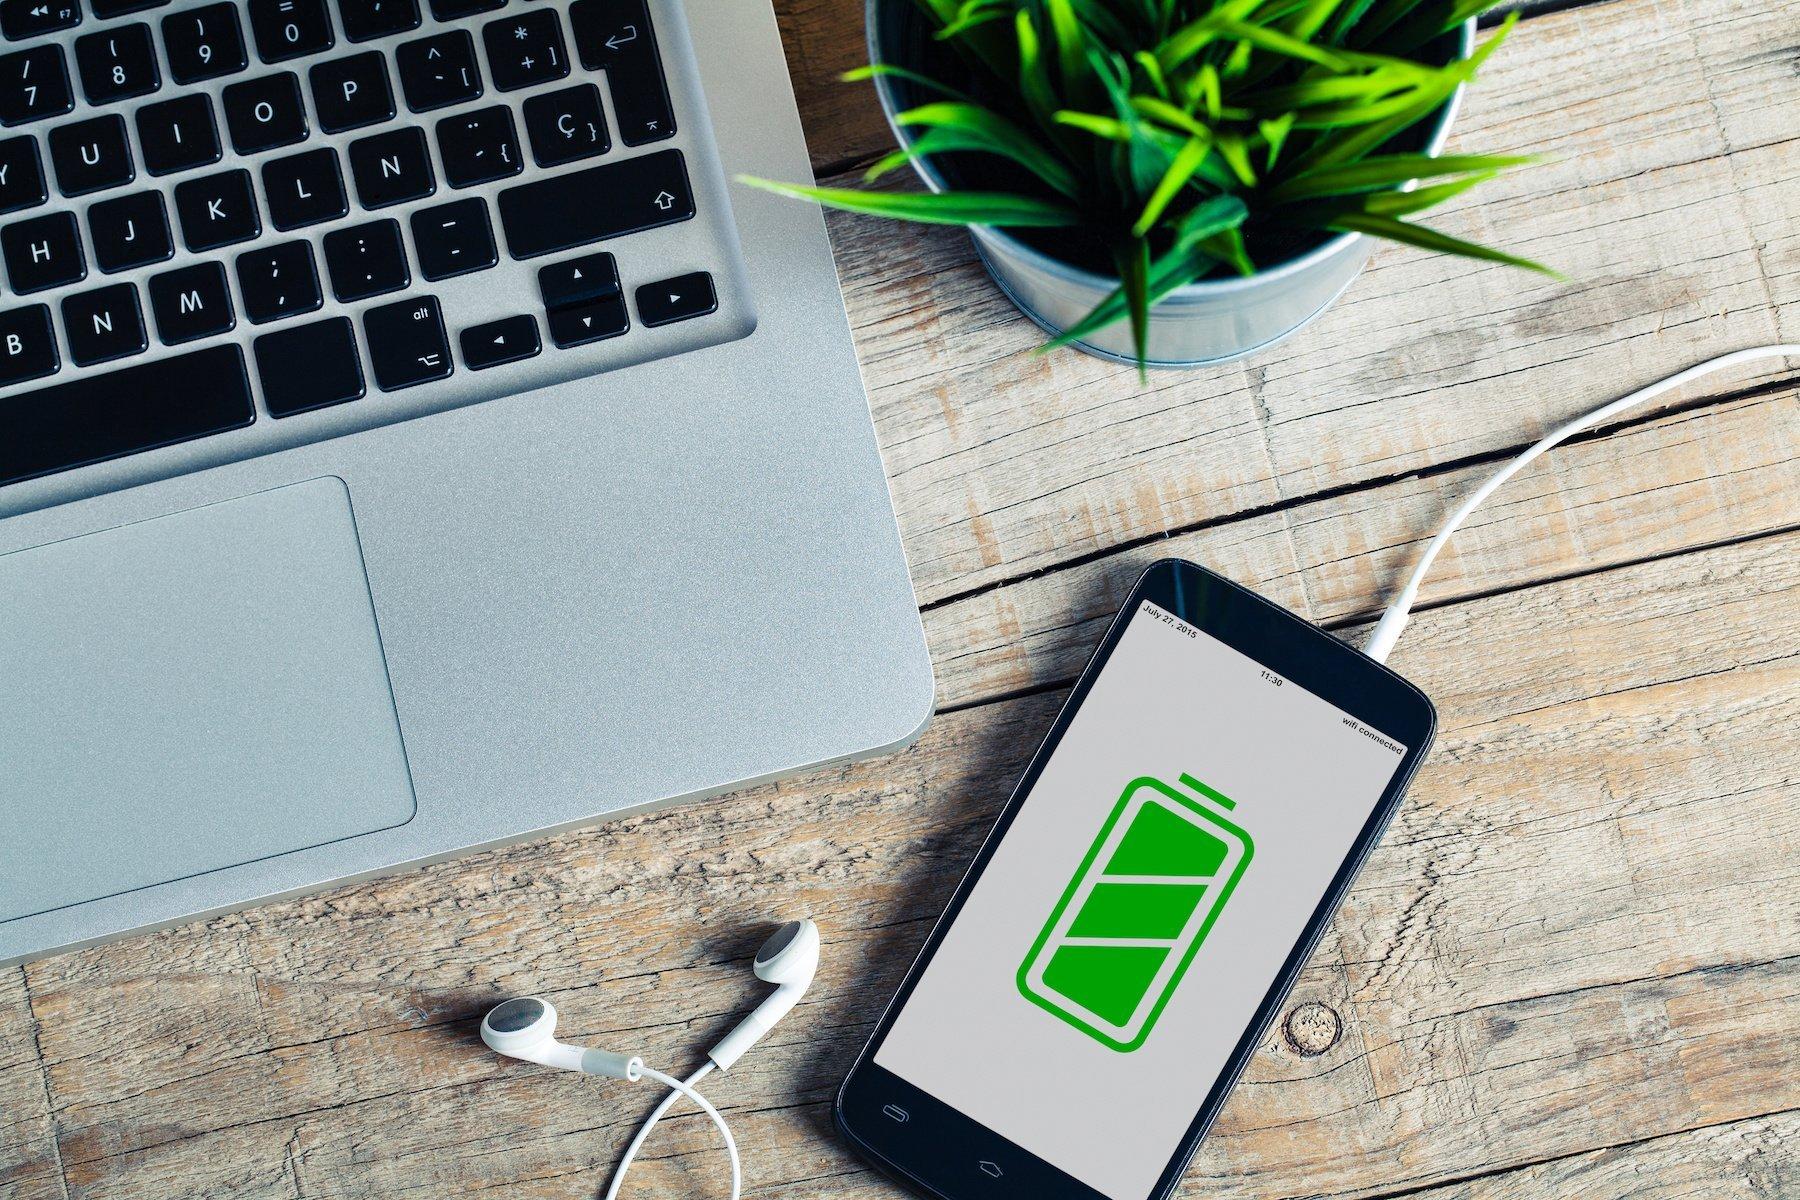 repair cell phone apple android iphone ipad tablet kelowna repair express